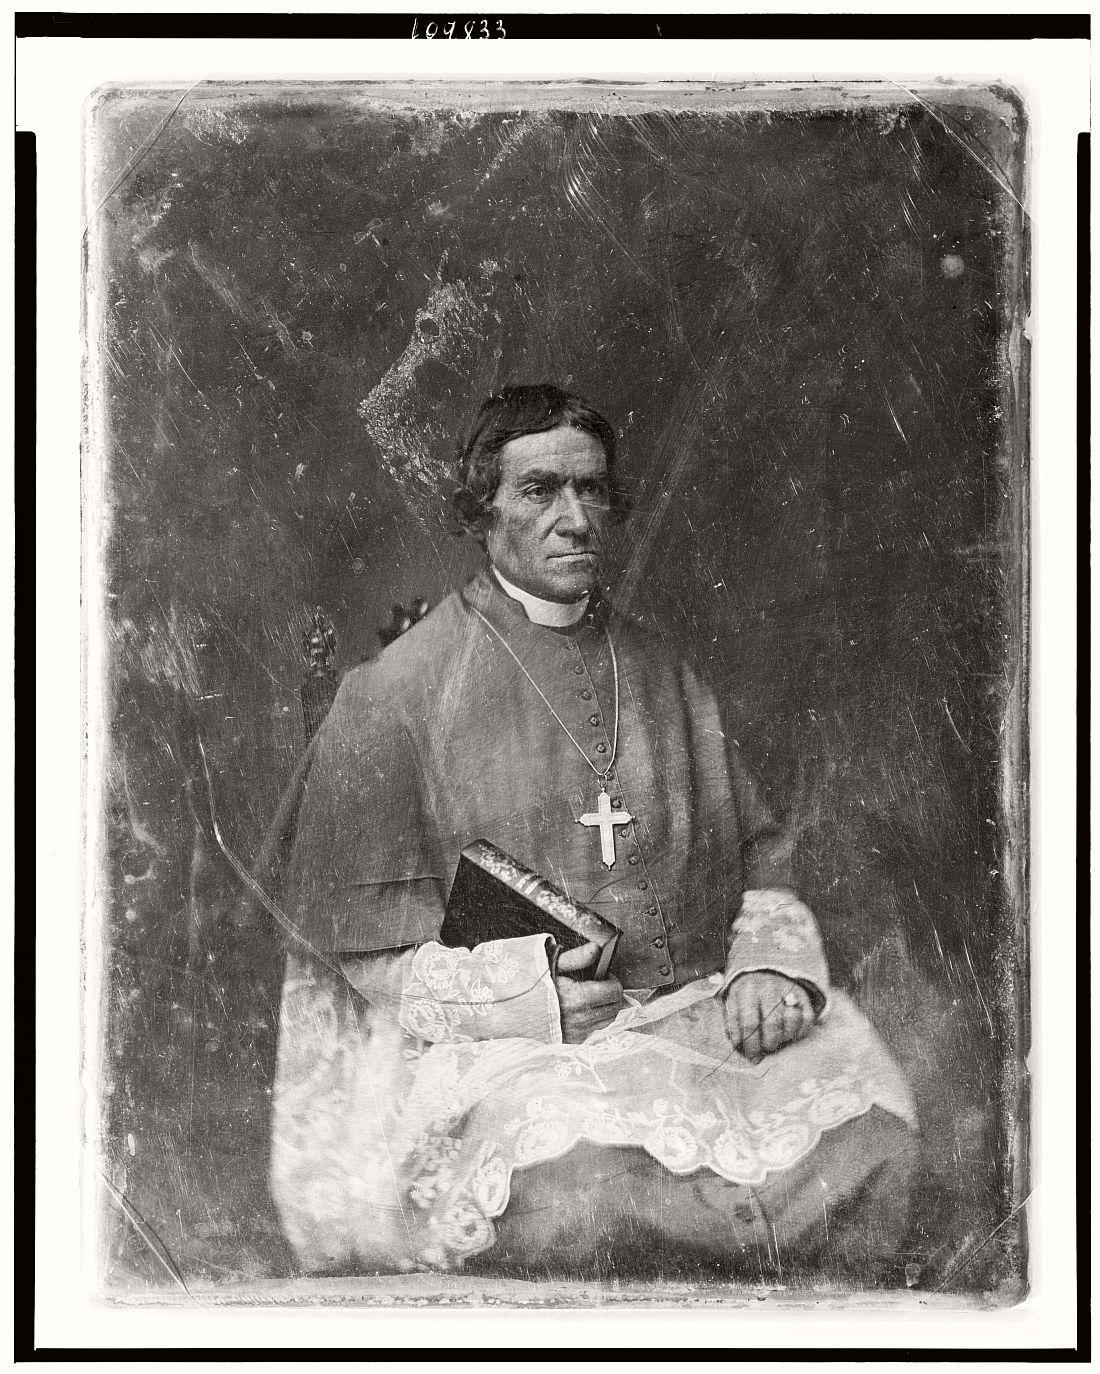 vintage-daguerreotype-portraits-from-xix-century-1844-1860-03